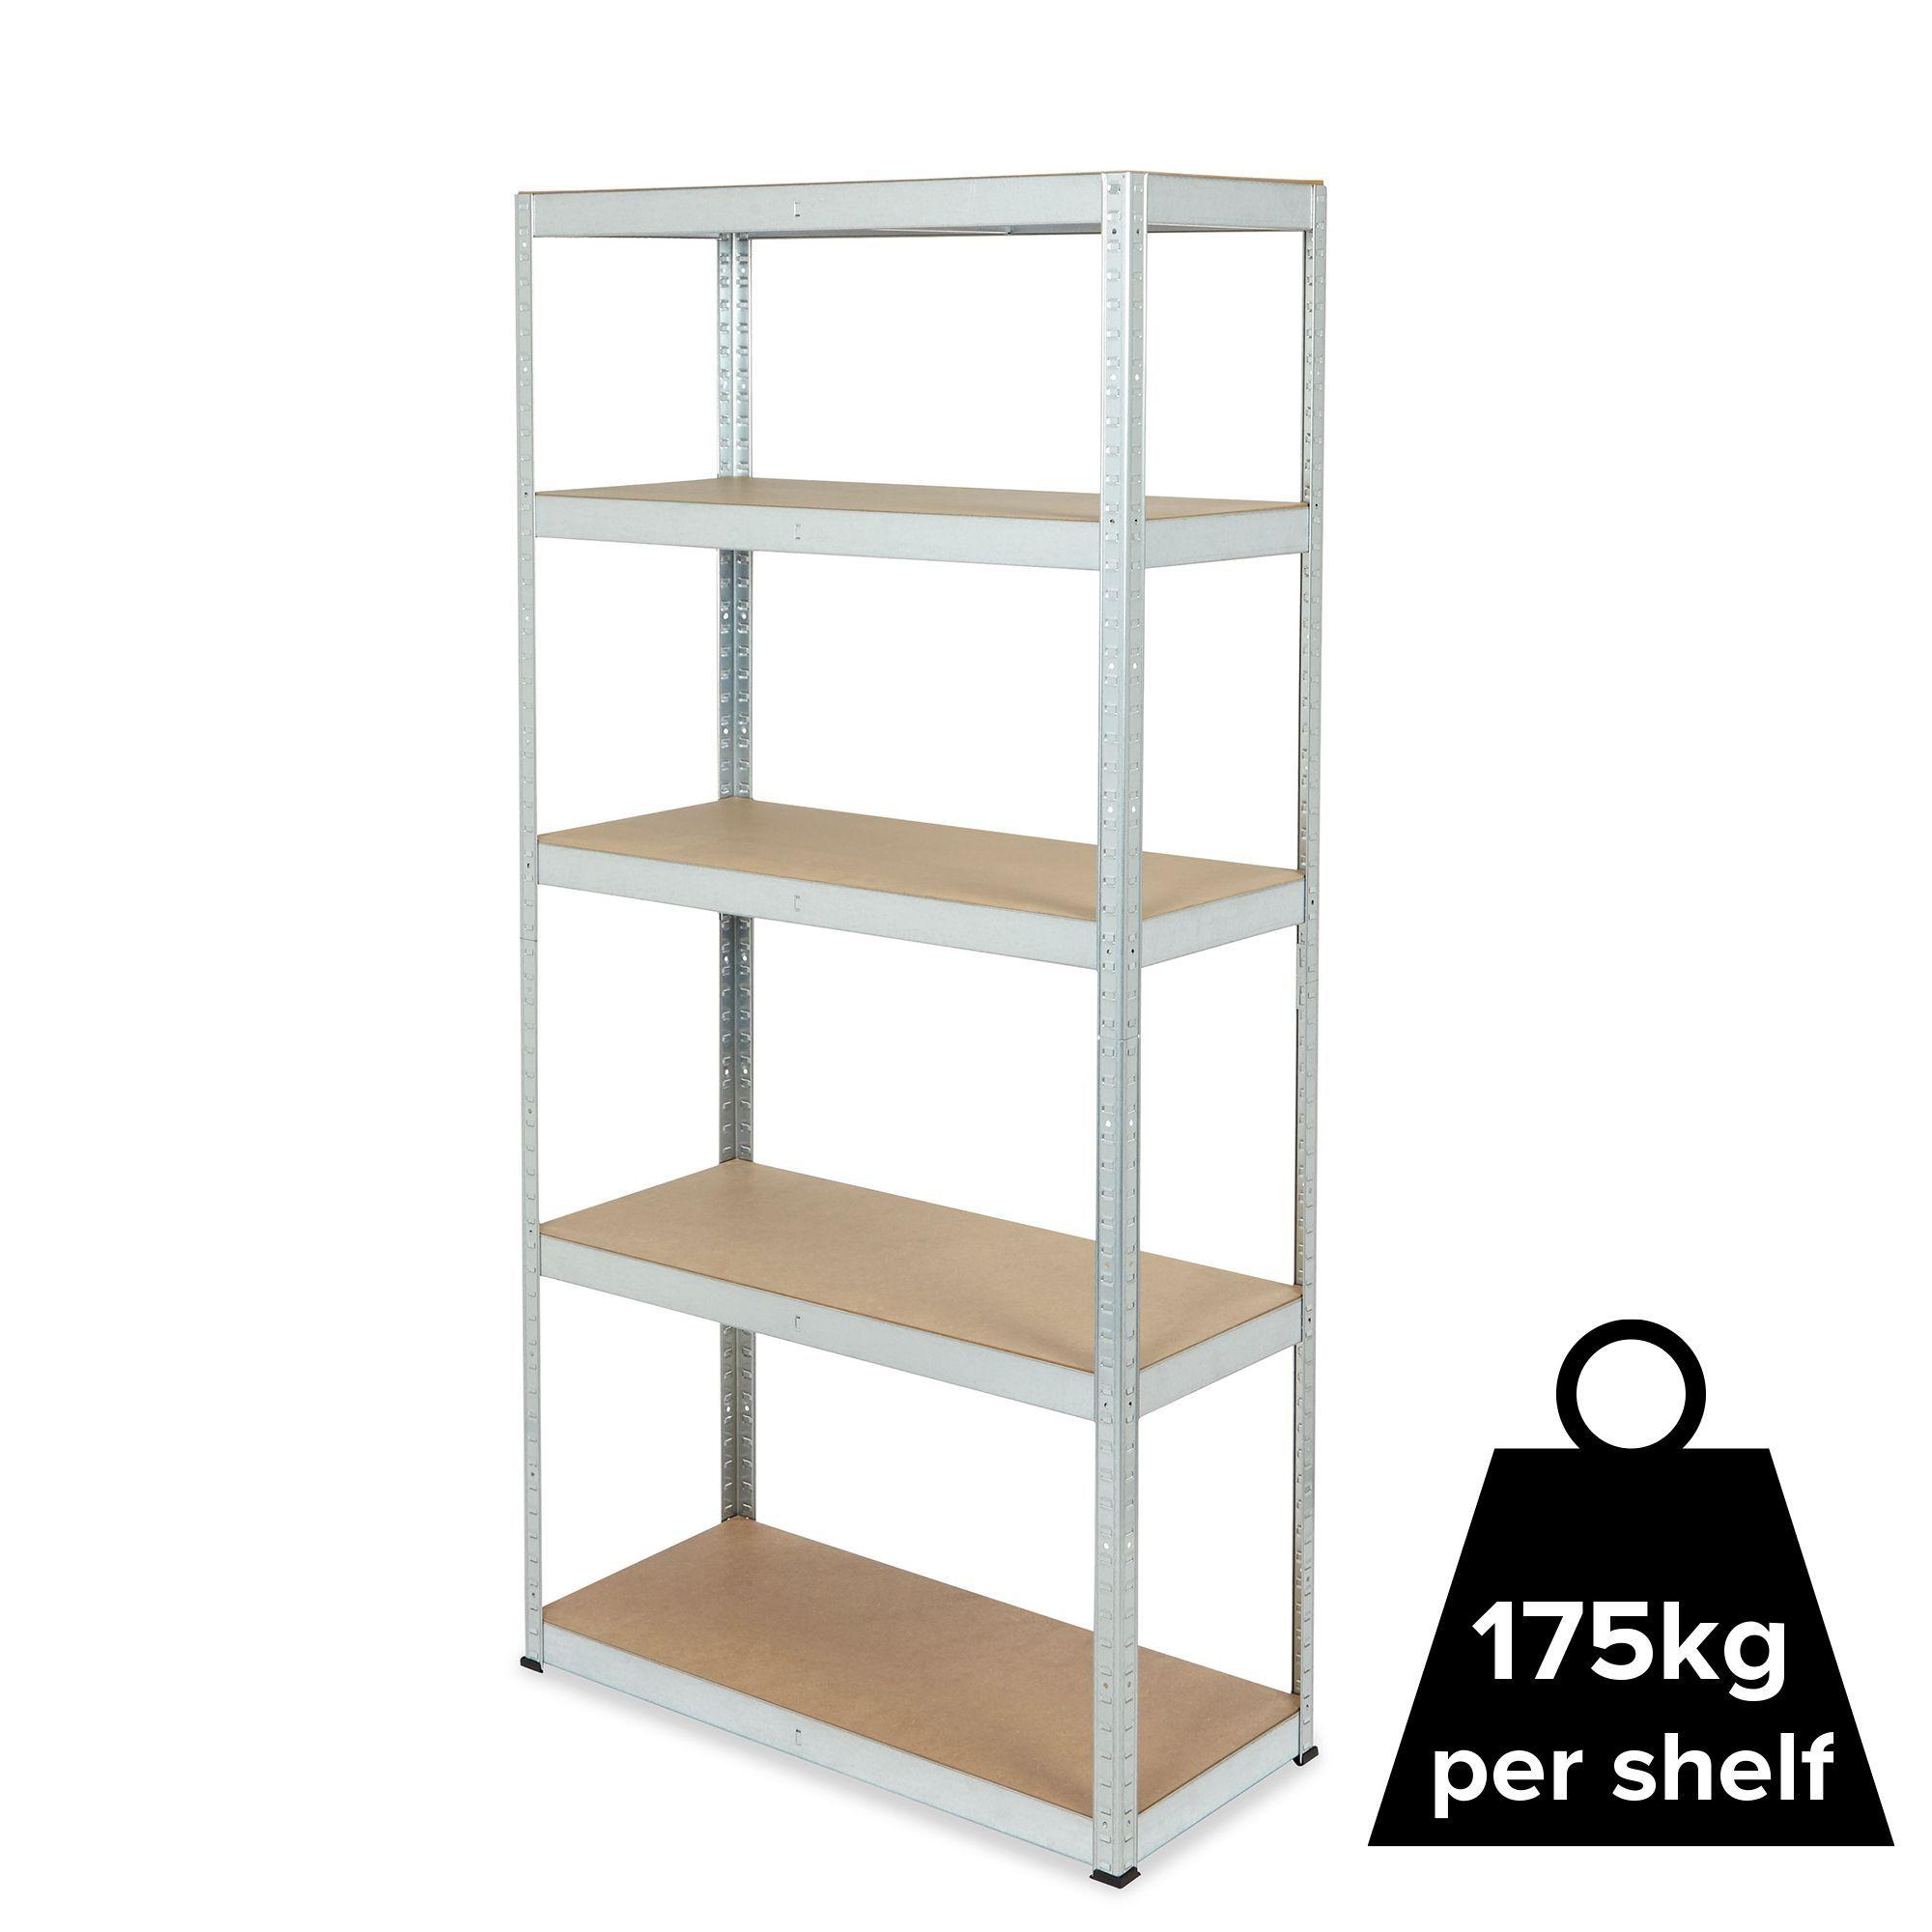 Diy Shelving Unit: 5 Shelf Steel 5 Tier Shelving Unit